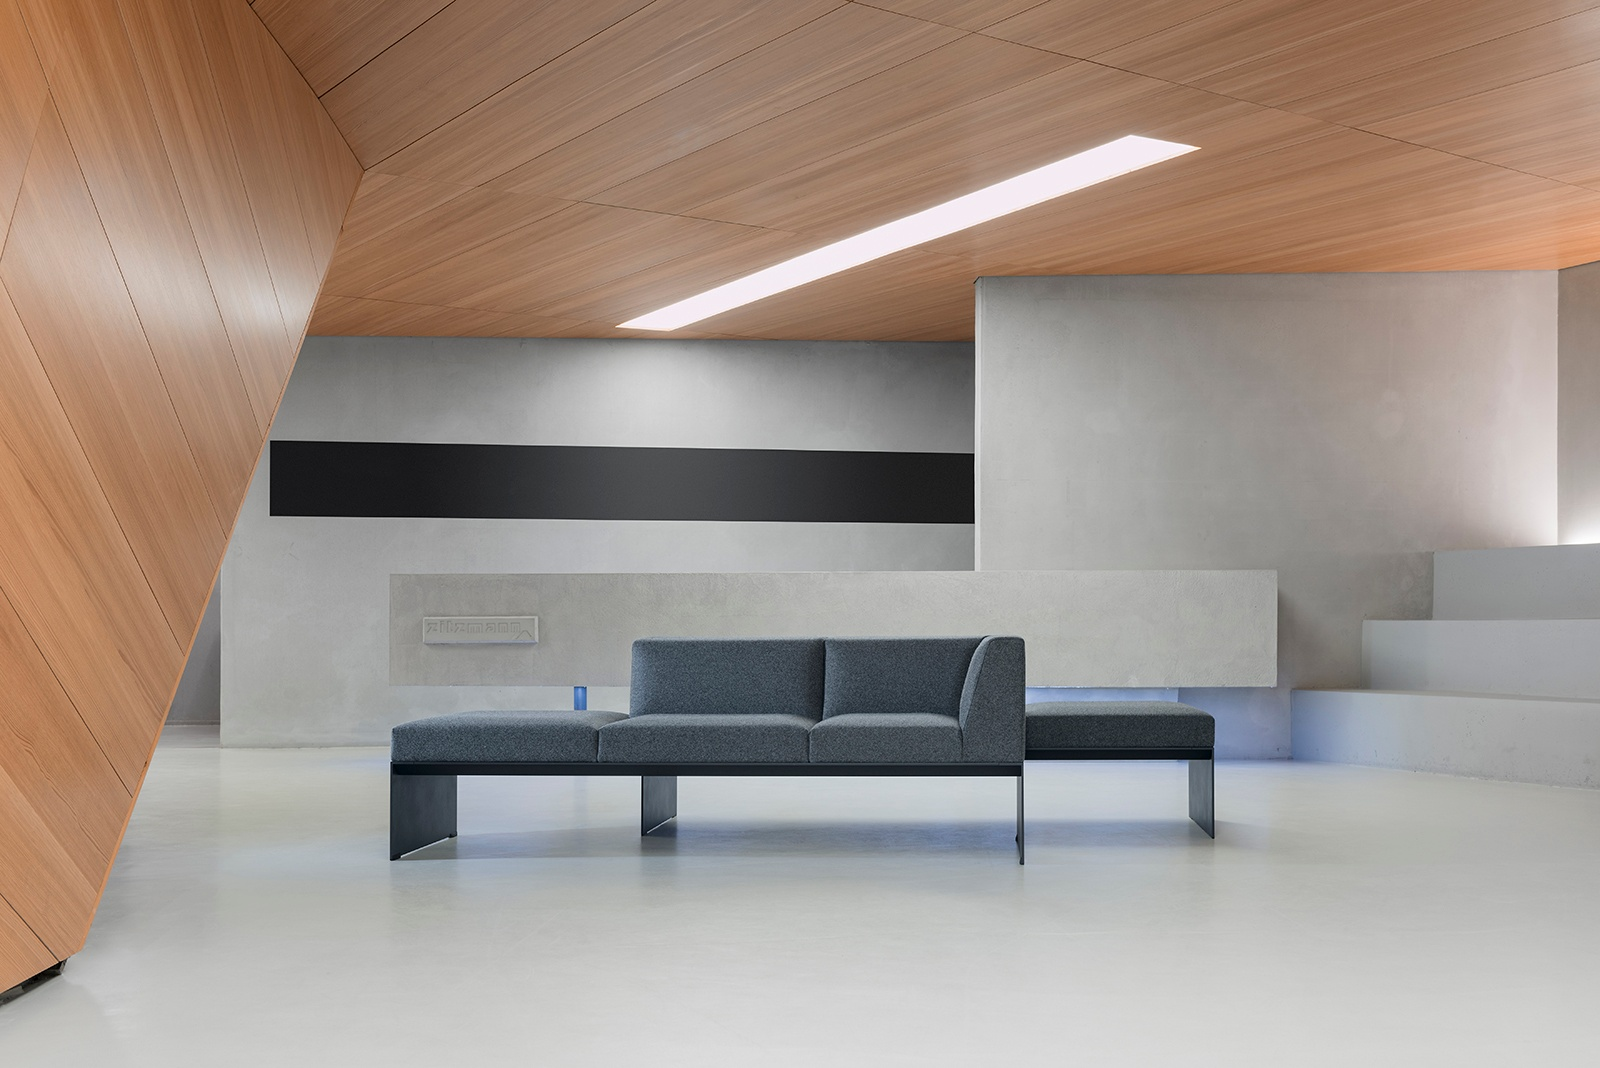 banc_lounge_BCH00_BC-H40_BC-H40_divina_melange2_170_Loc_063-1600